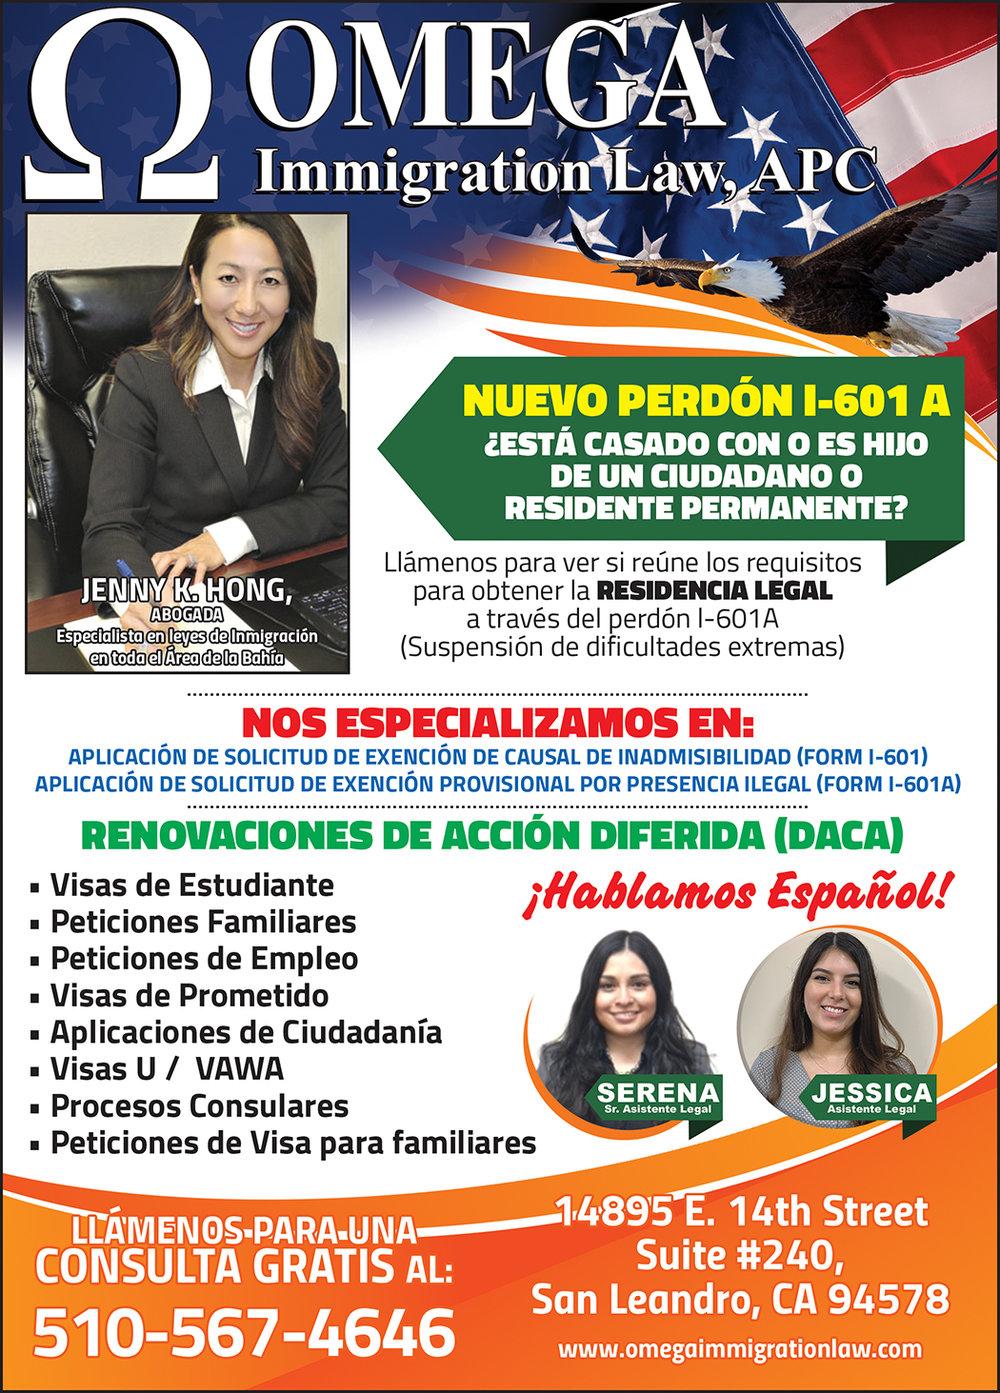 Omega Immigration Law APC 1 pag FEBRERO 2019.jpg